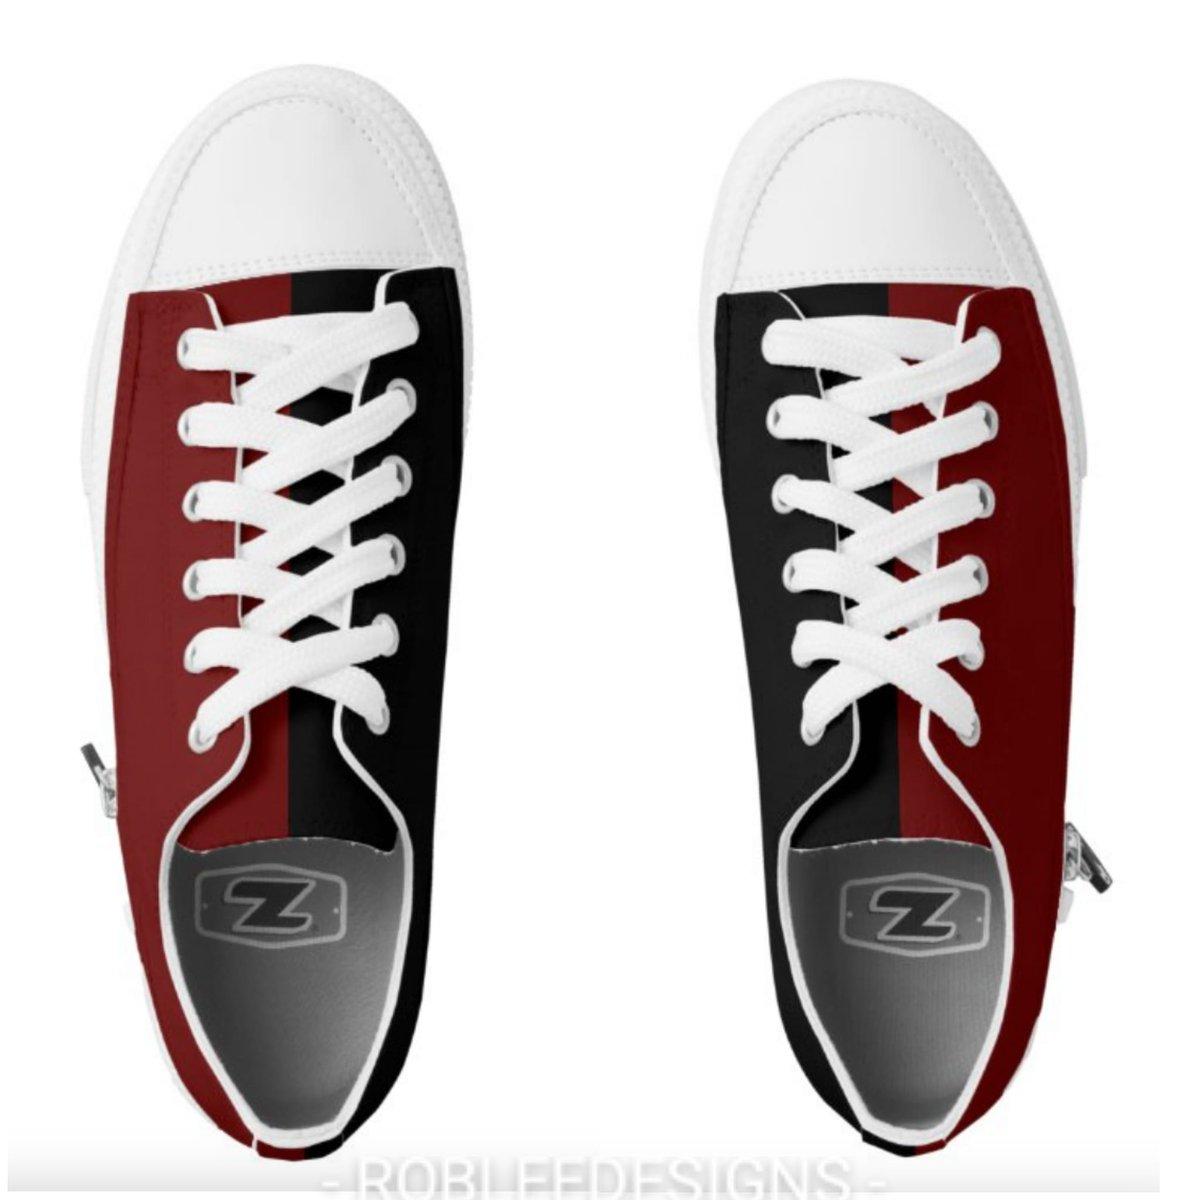 #Shoes #fashion #style #styleblogger #fashionstyle #styles  #stylish #shoppingonline #shoesaddict #shoesforsale #shoesoftheday  #new #trending #trend #trendy  #sneakers #sneaker #sneakerhead #mensfashion #tbt #letsgo  https://t.co/r36qQS9KSp $91 Zip Shoes https://t.co/dPv6UcGSCC